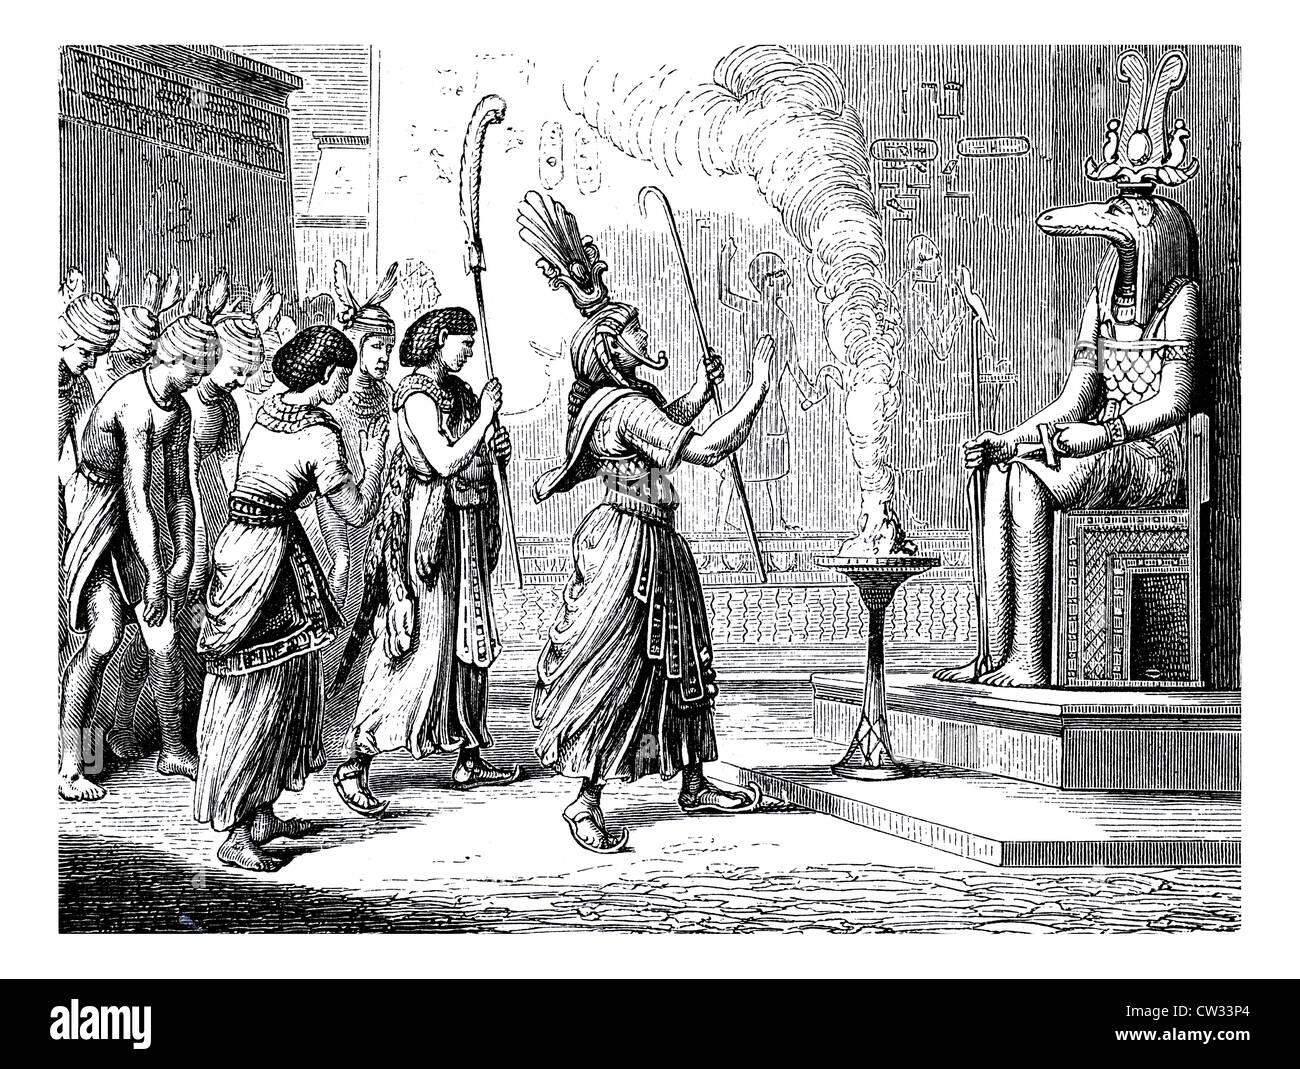 Egyptian God Of Fertility Stock Photos & Egyptian God Of